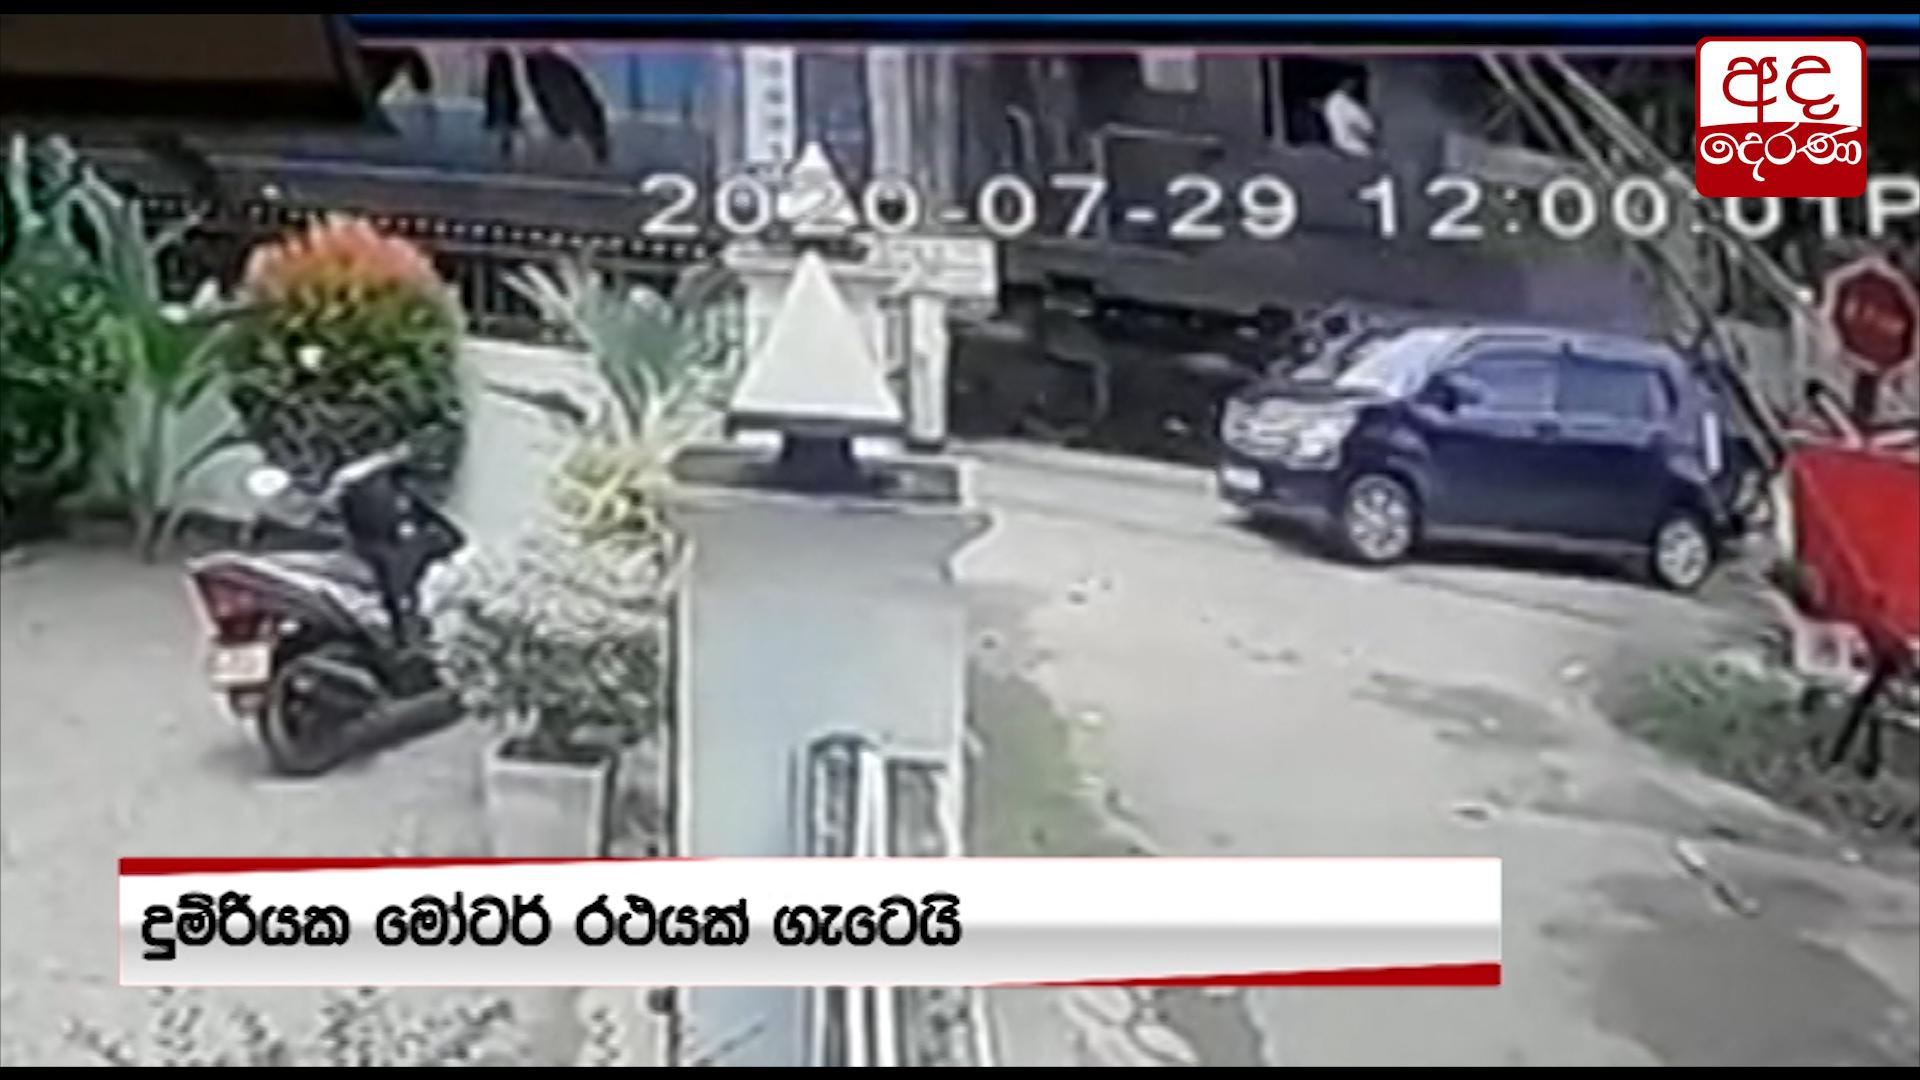 Man hospitalized in car-train collision in Wadduwa